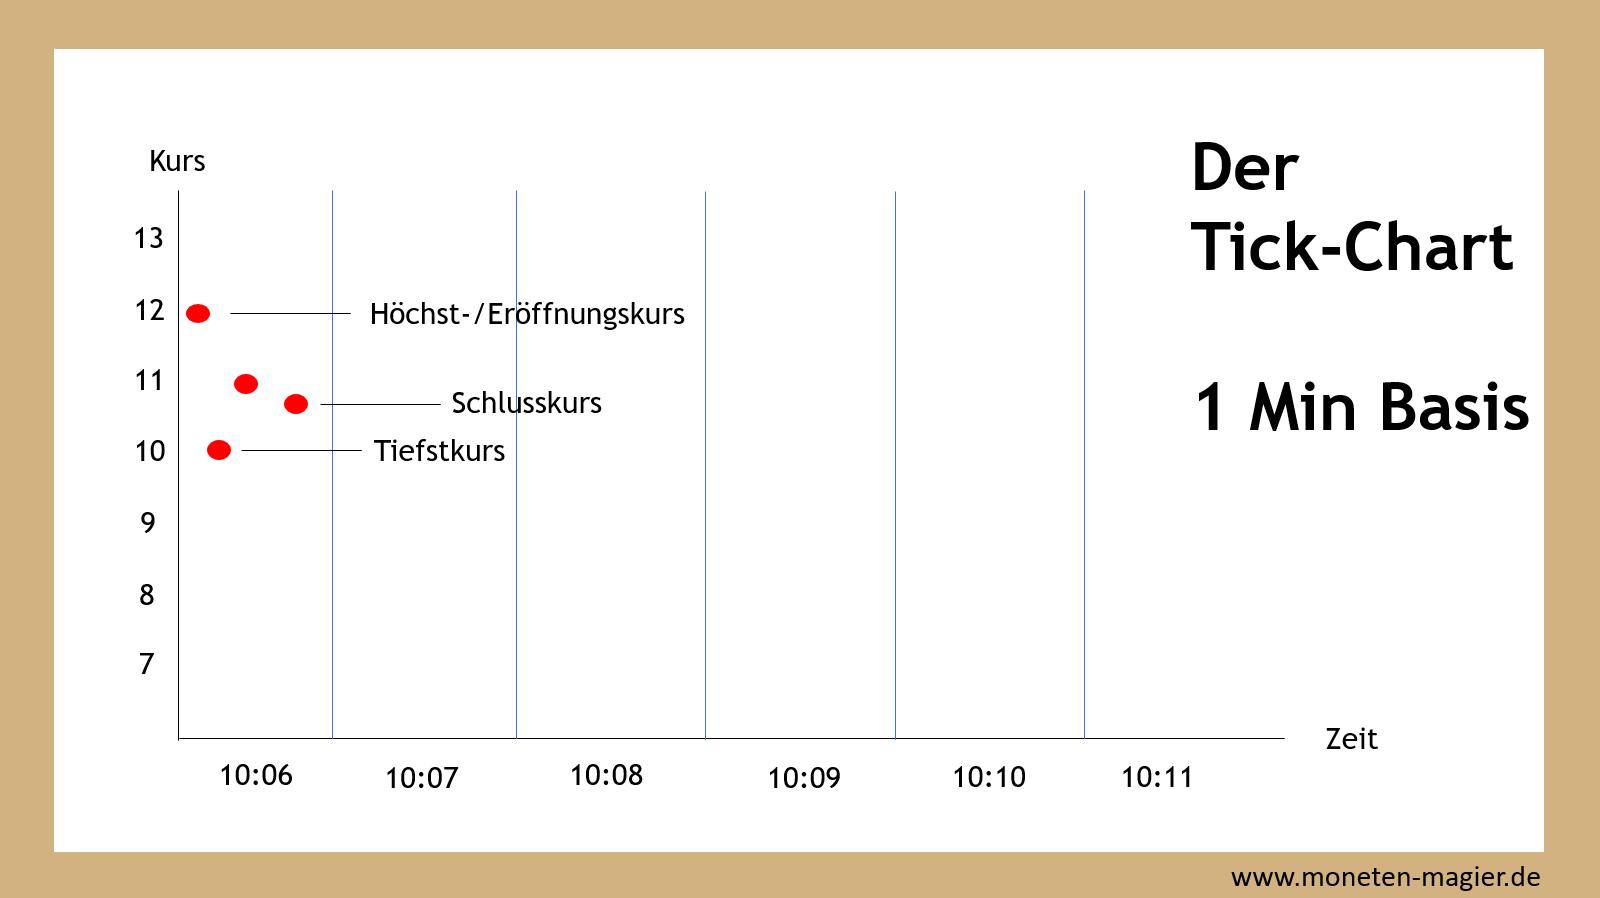 charttechnik fuer einsteiger moneten magier tick chart kurse zeiteinheit